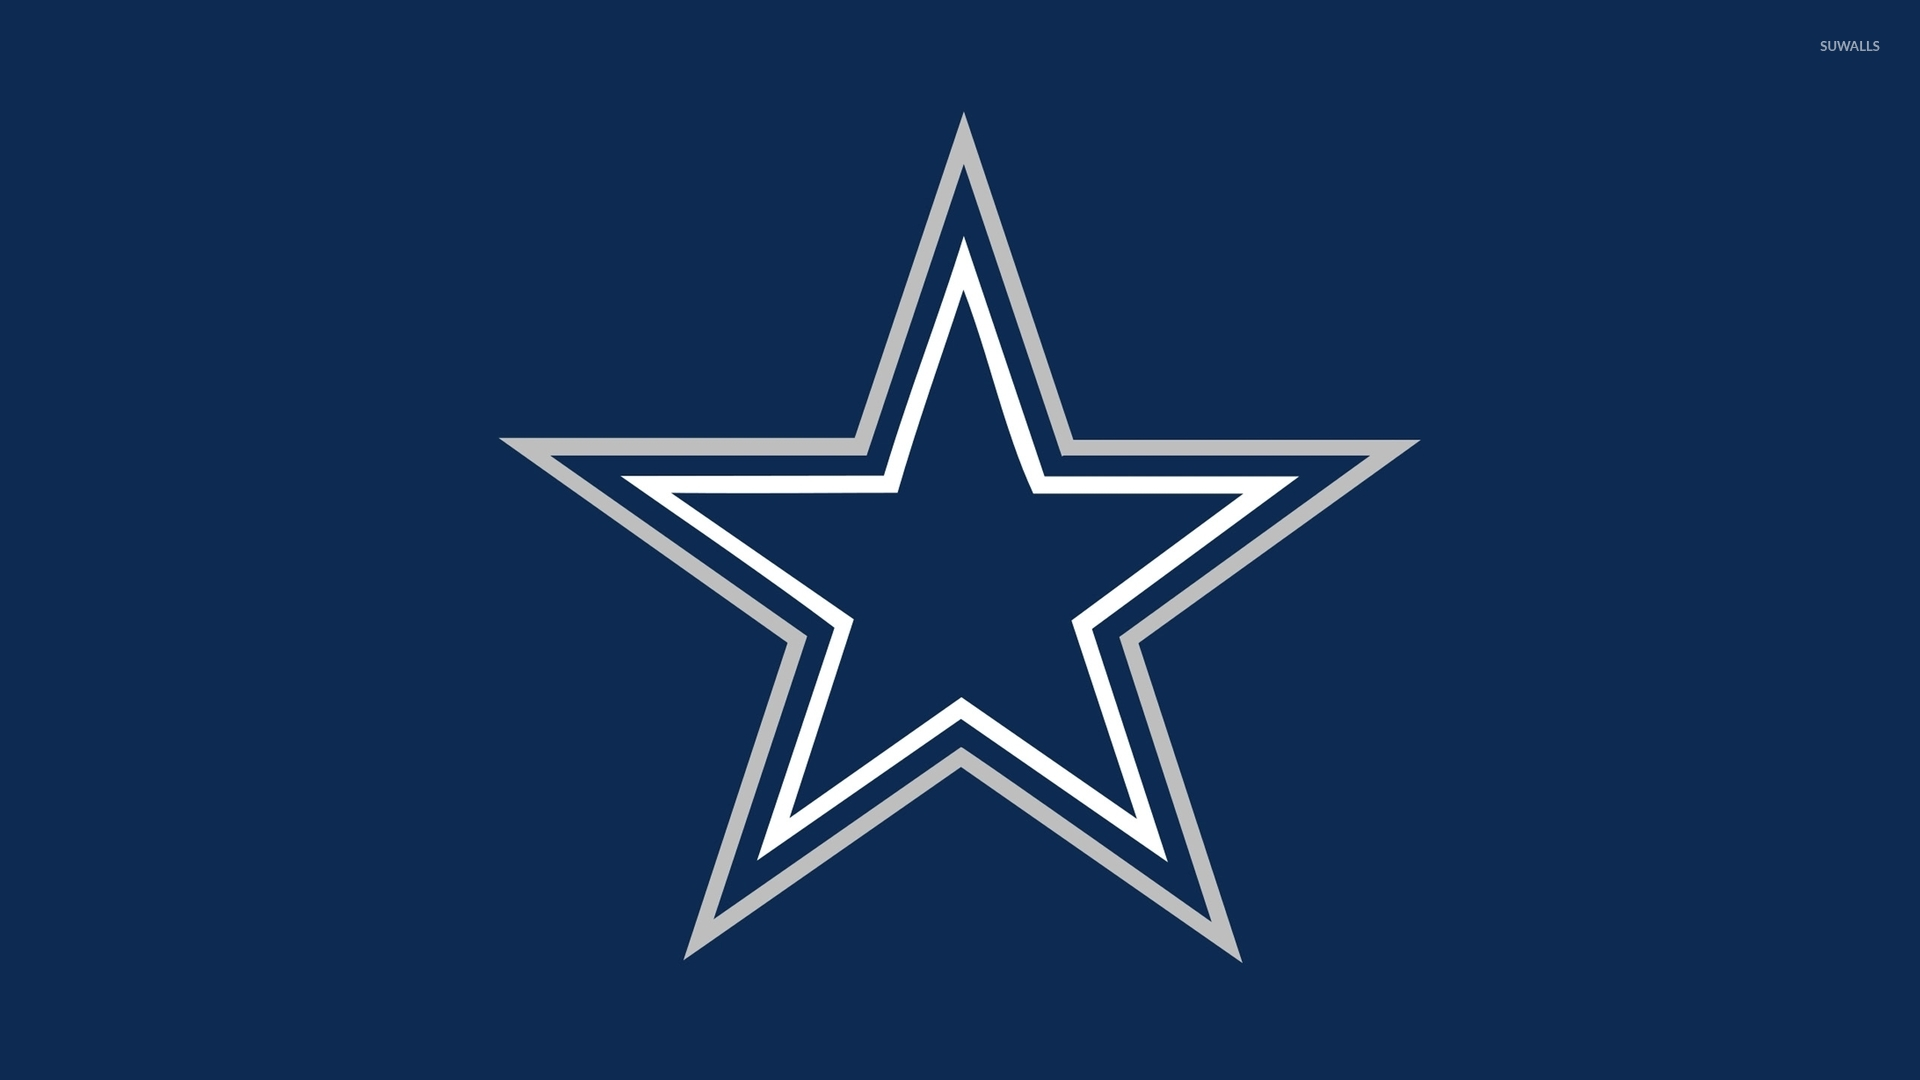 Dallas Cowboys wallpaper 1920x1080 1920x1080